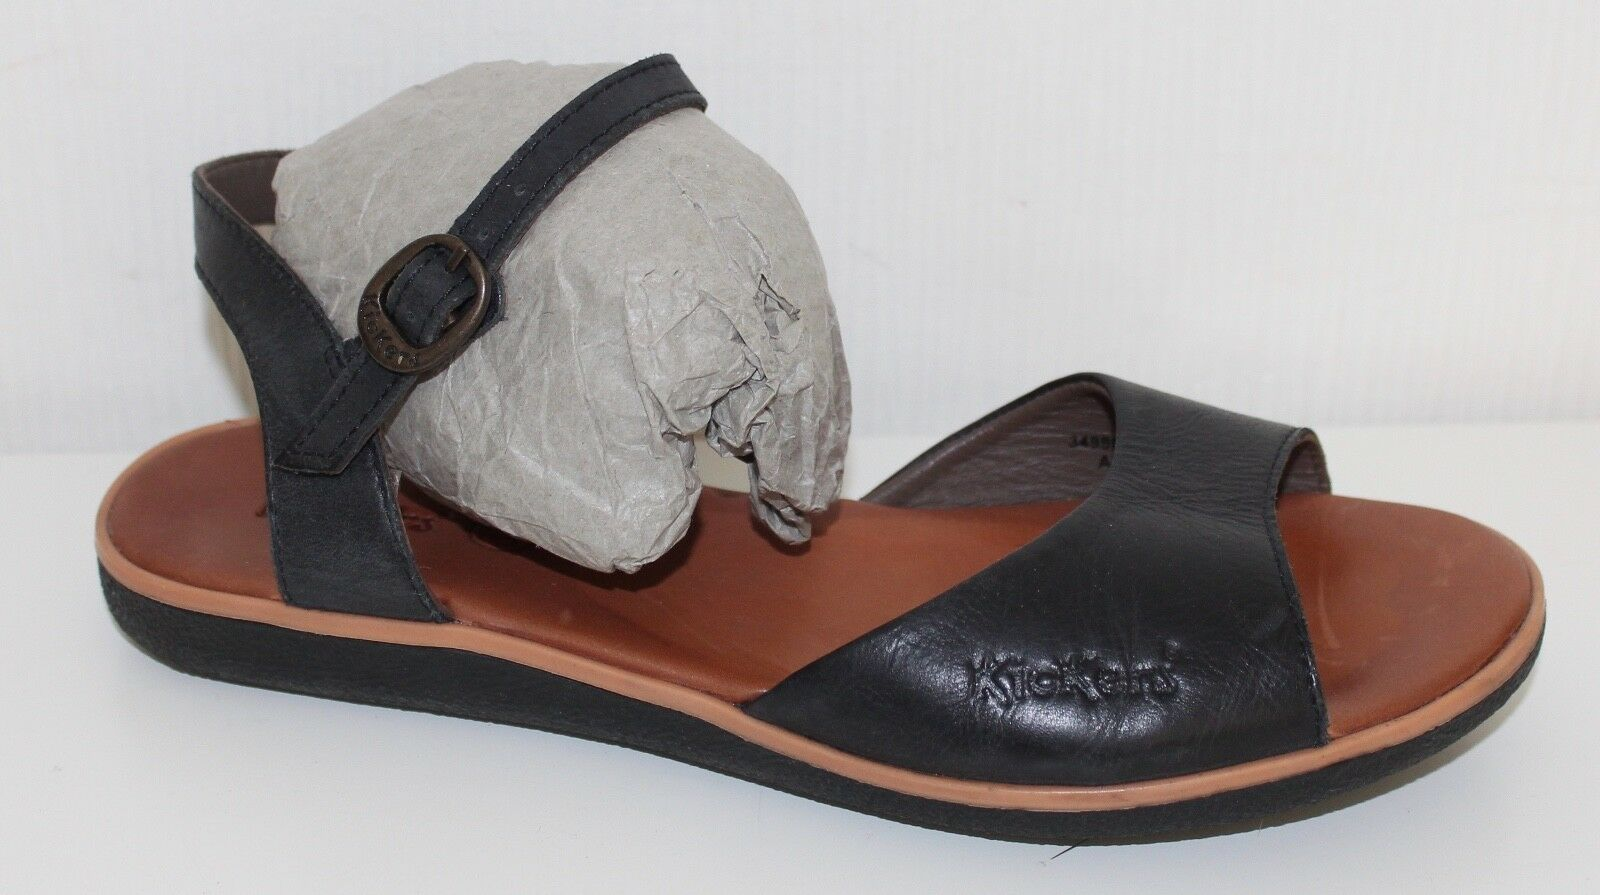 KICKERS Damen echt Leder SCHUHE Leder Sandalen Größe 37 Topzustand Leder SCHUHE SANDALS UK4 88d35c